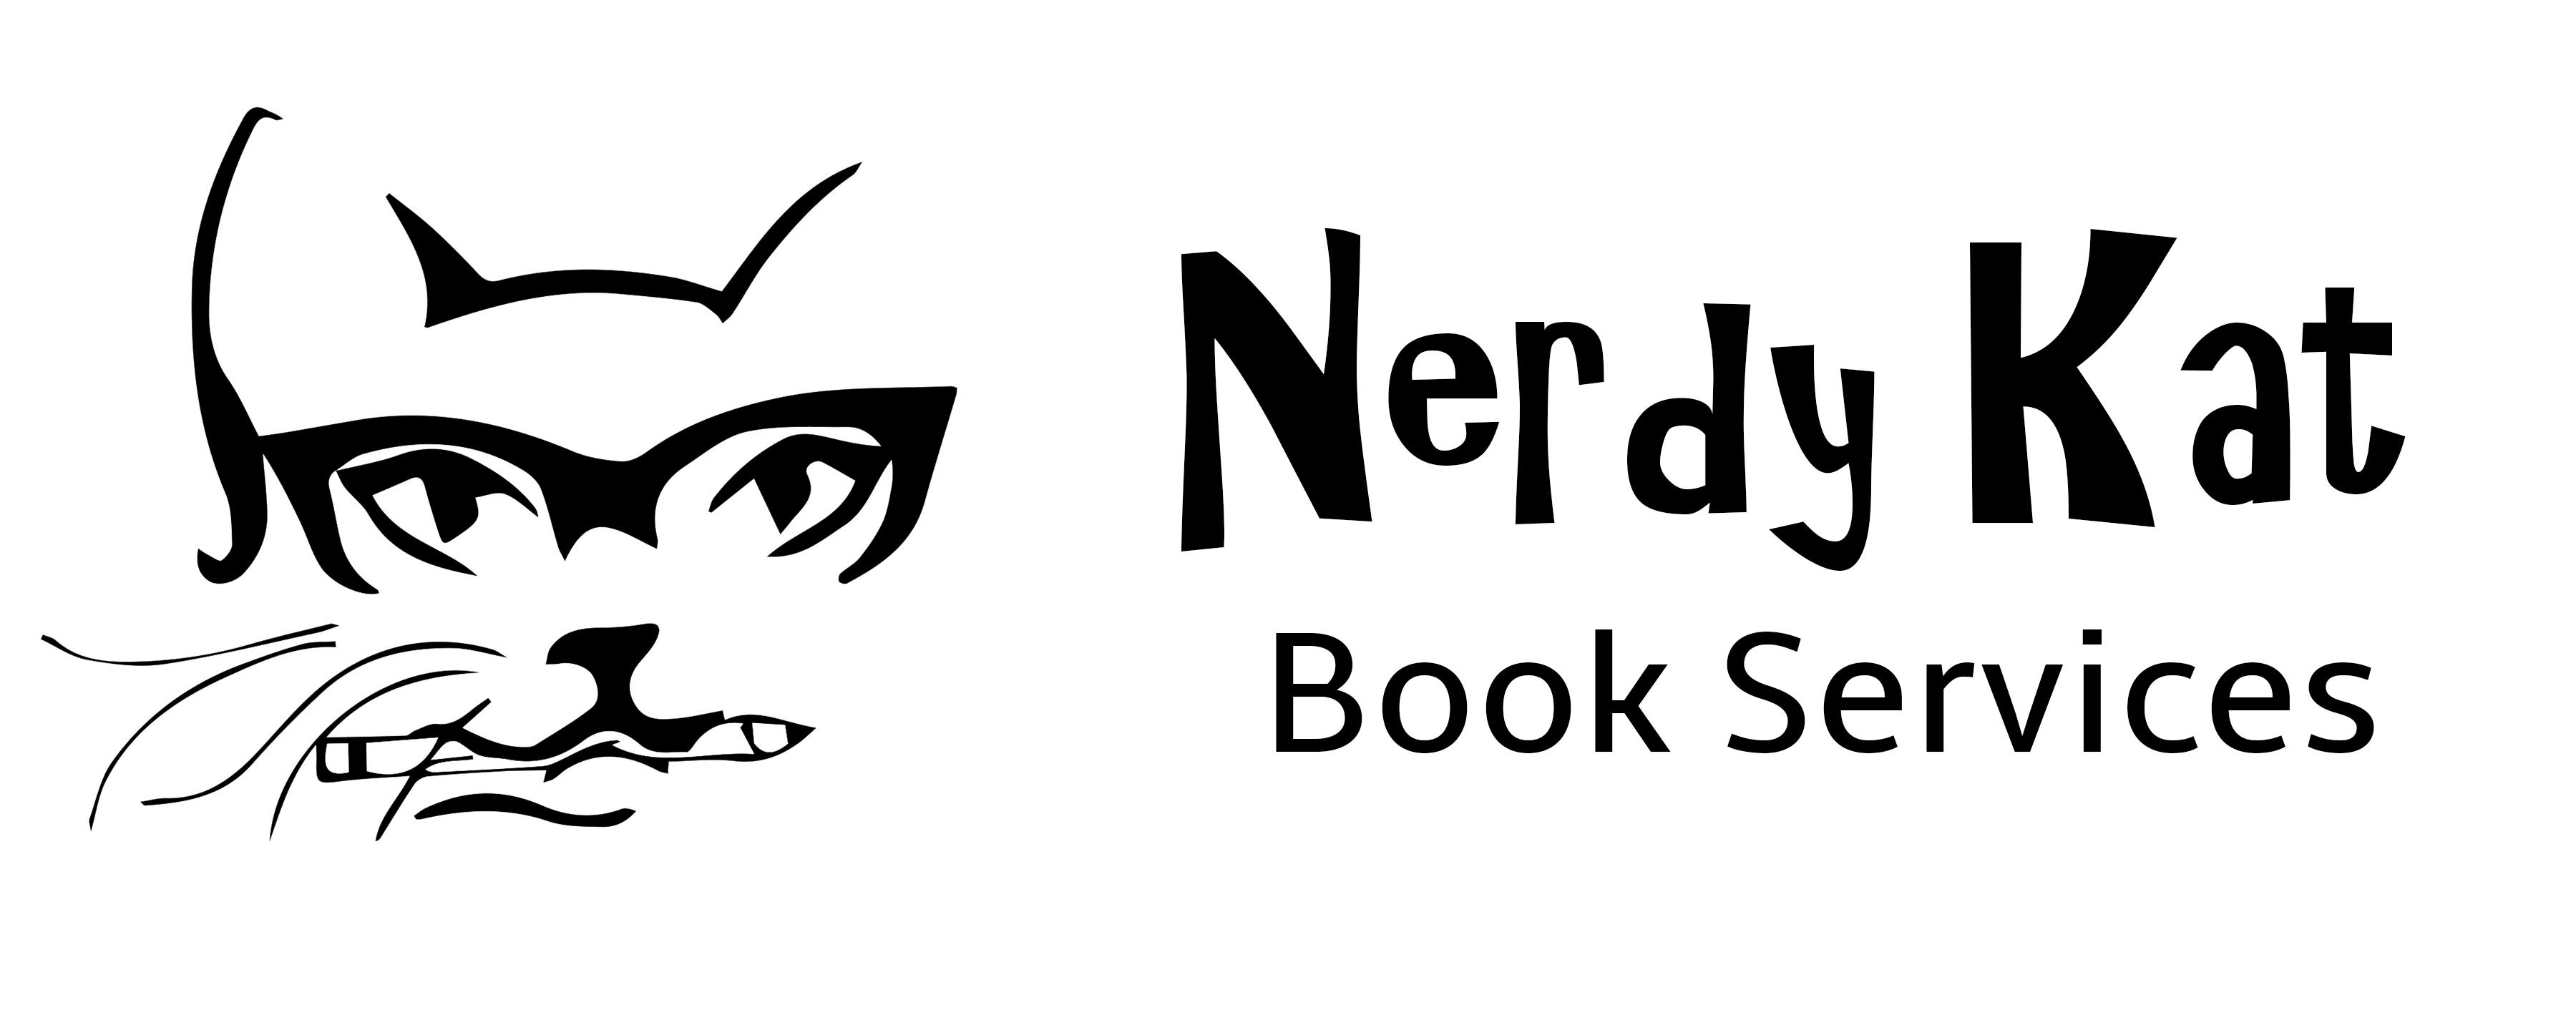 Nerdy Kat Books